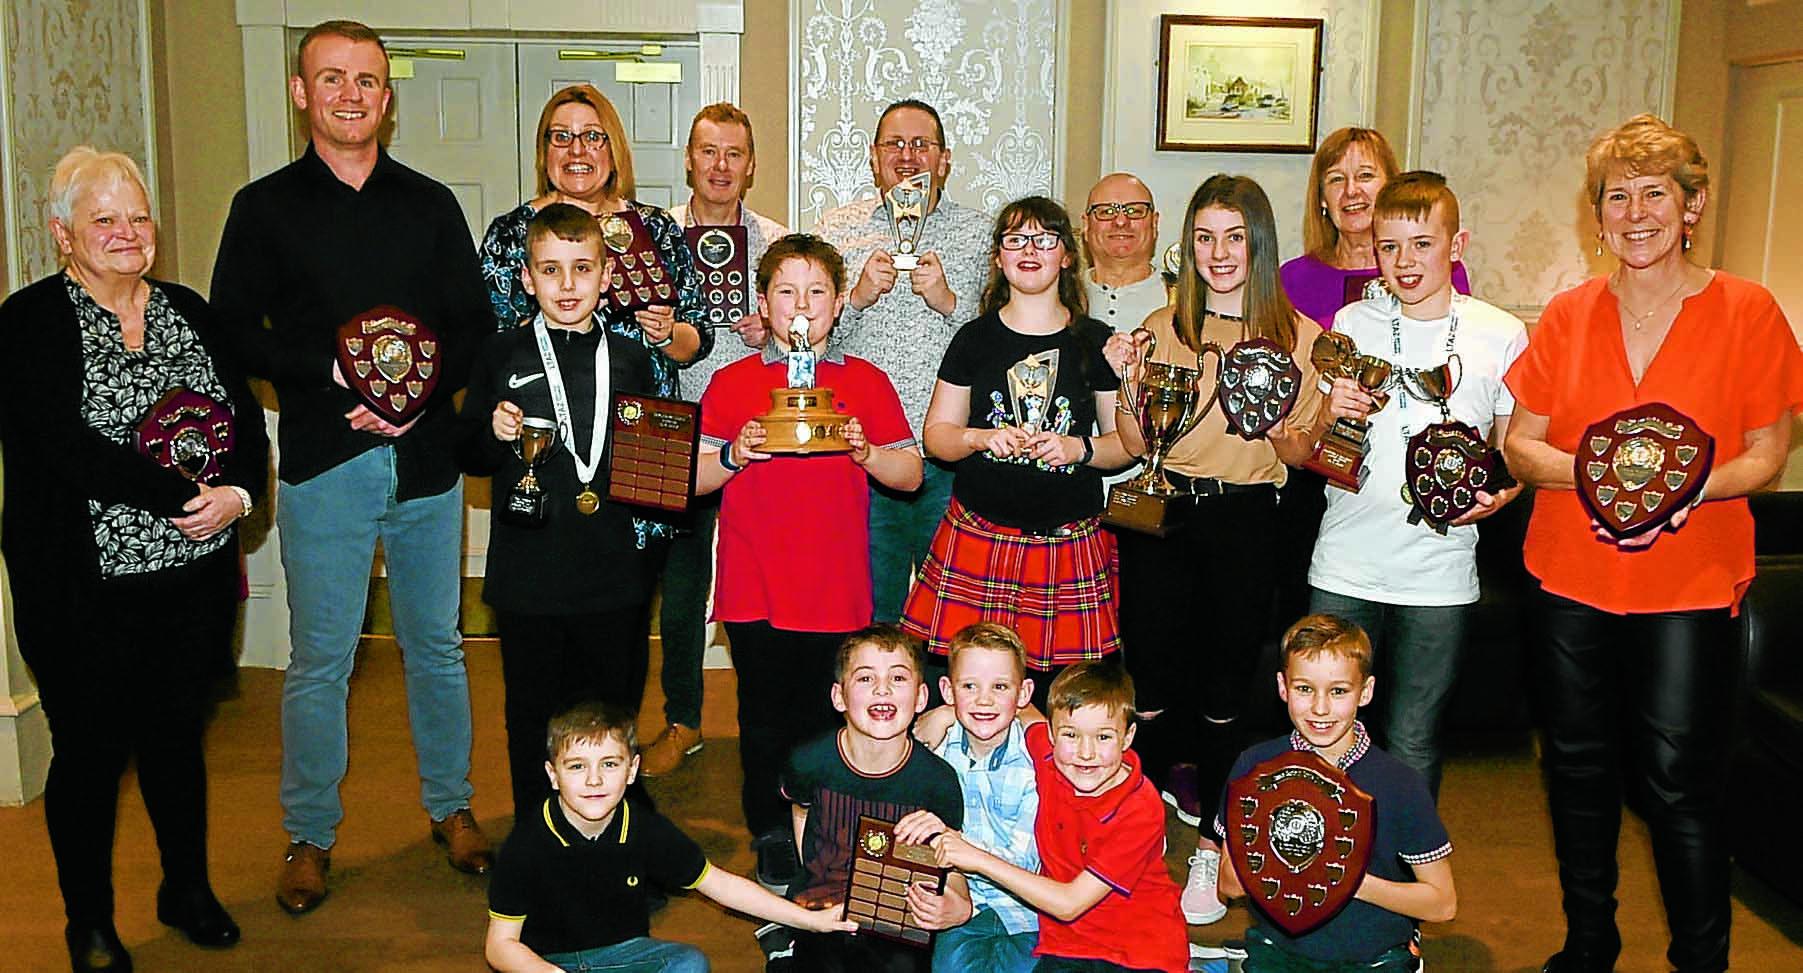 Celebrating success at Seaforth Tennis Club